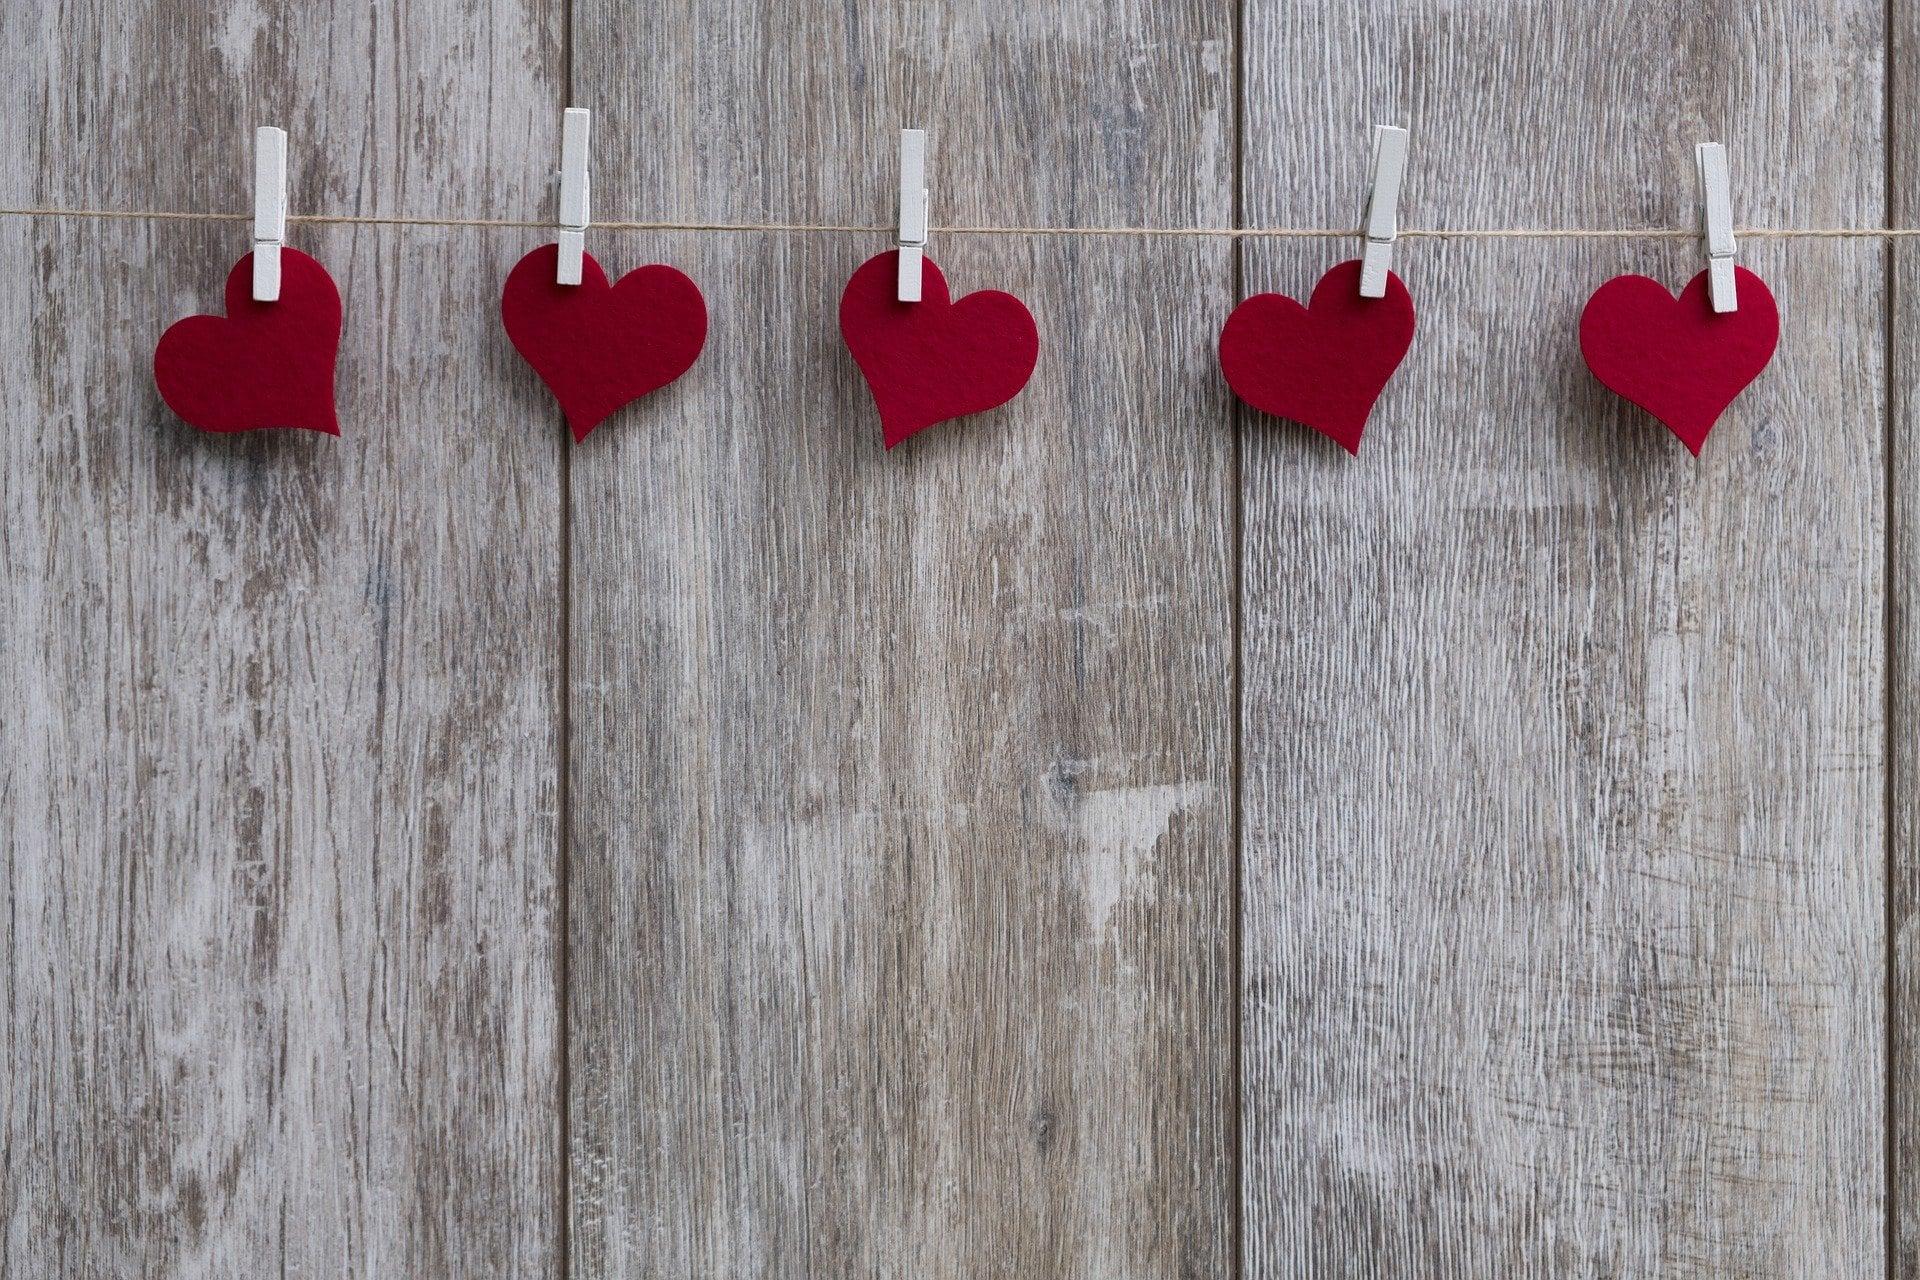 Cute Valentines Day Desktop Backgrounds POPSUGAR Tech 1920x1280